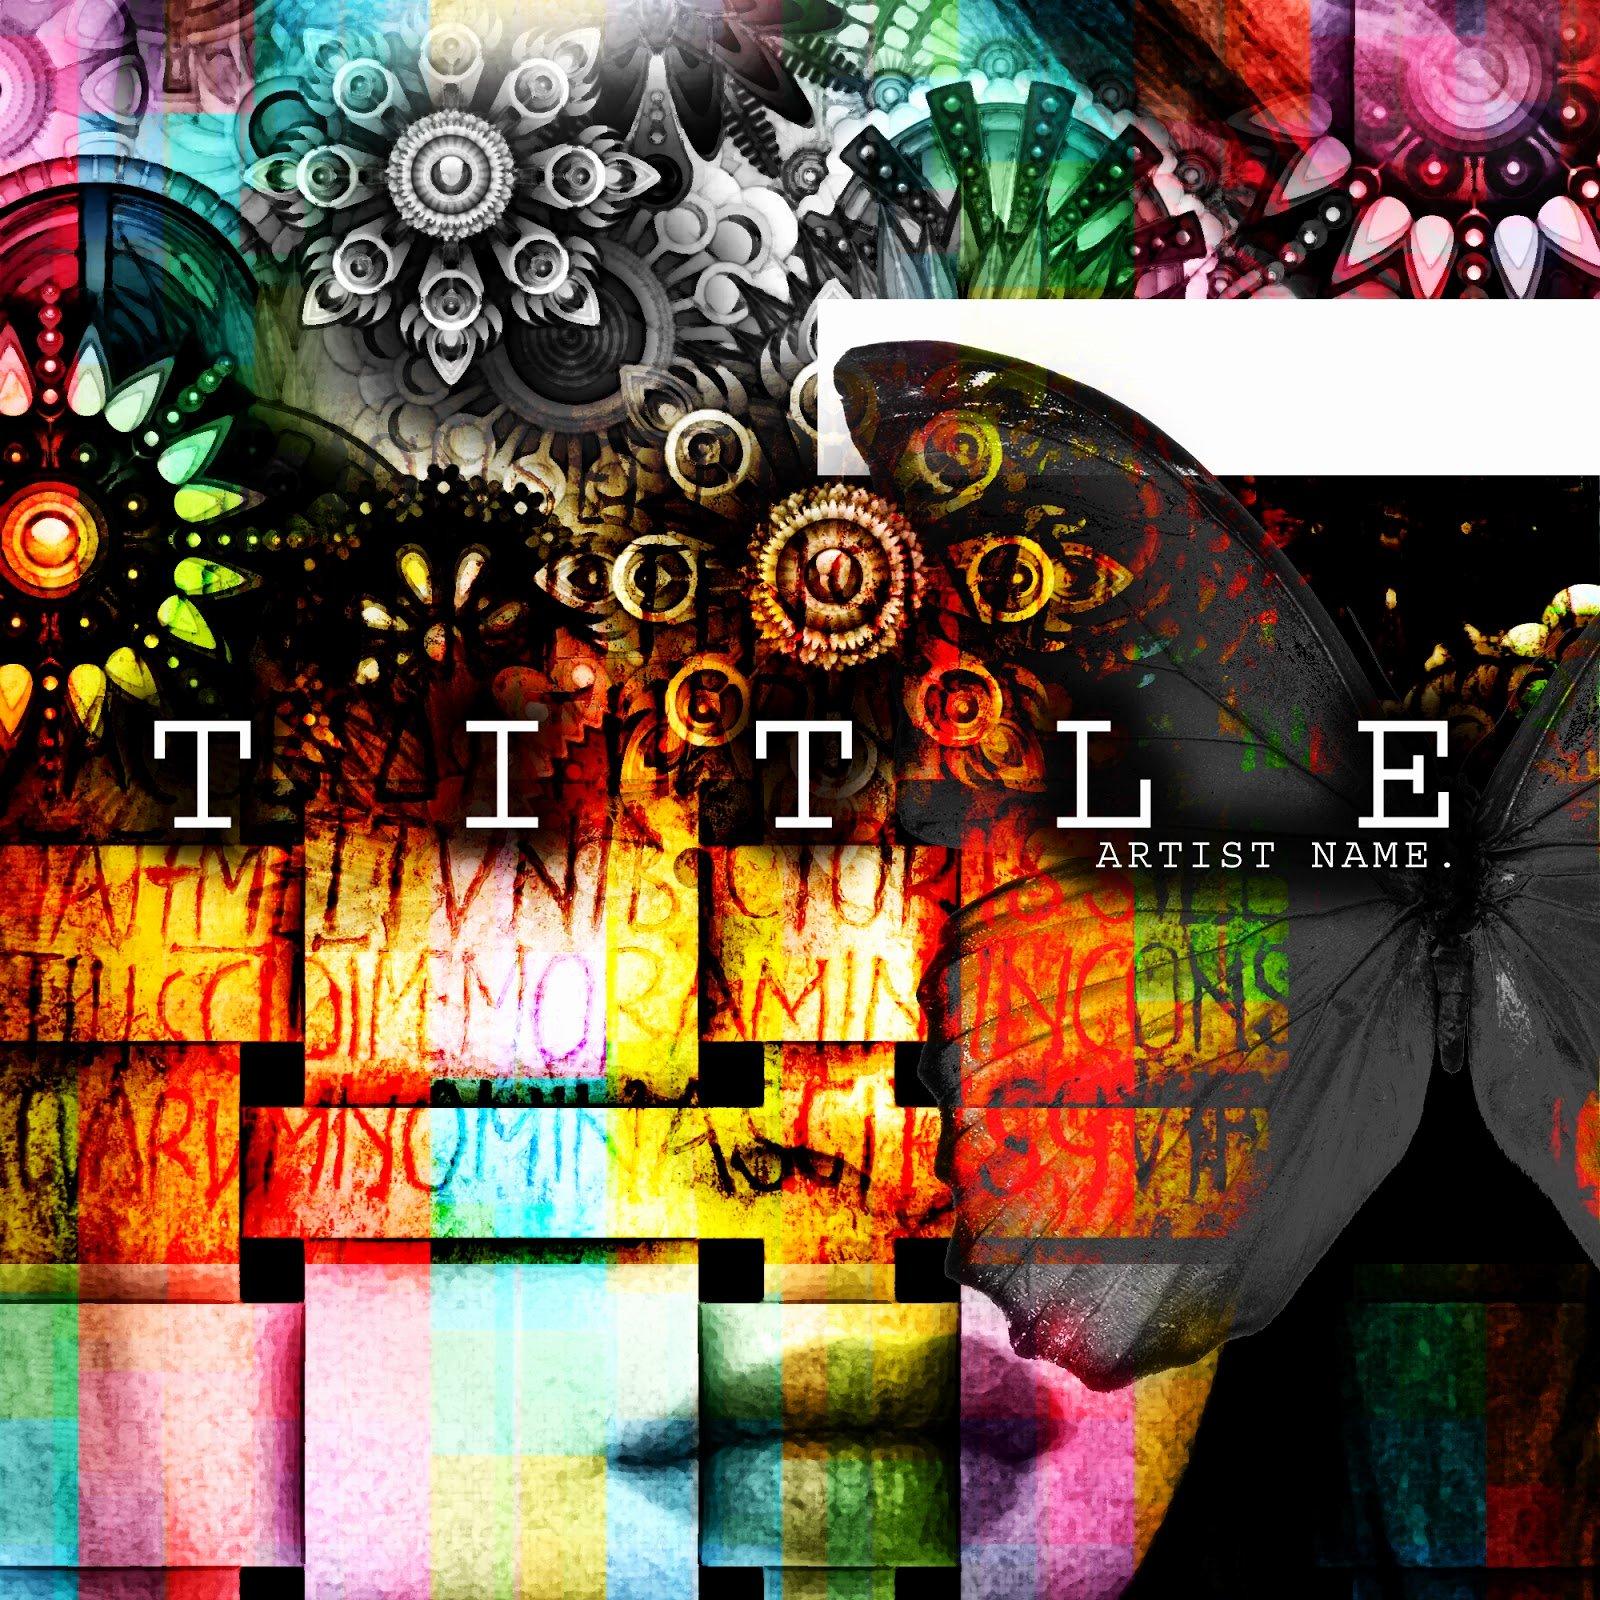 Free Dvd Cover Art Best Of Music Single Album Mixtape Cd Cover Artwork Graphic Design